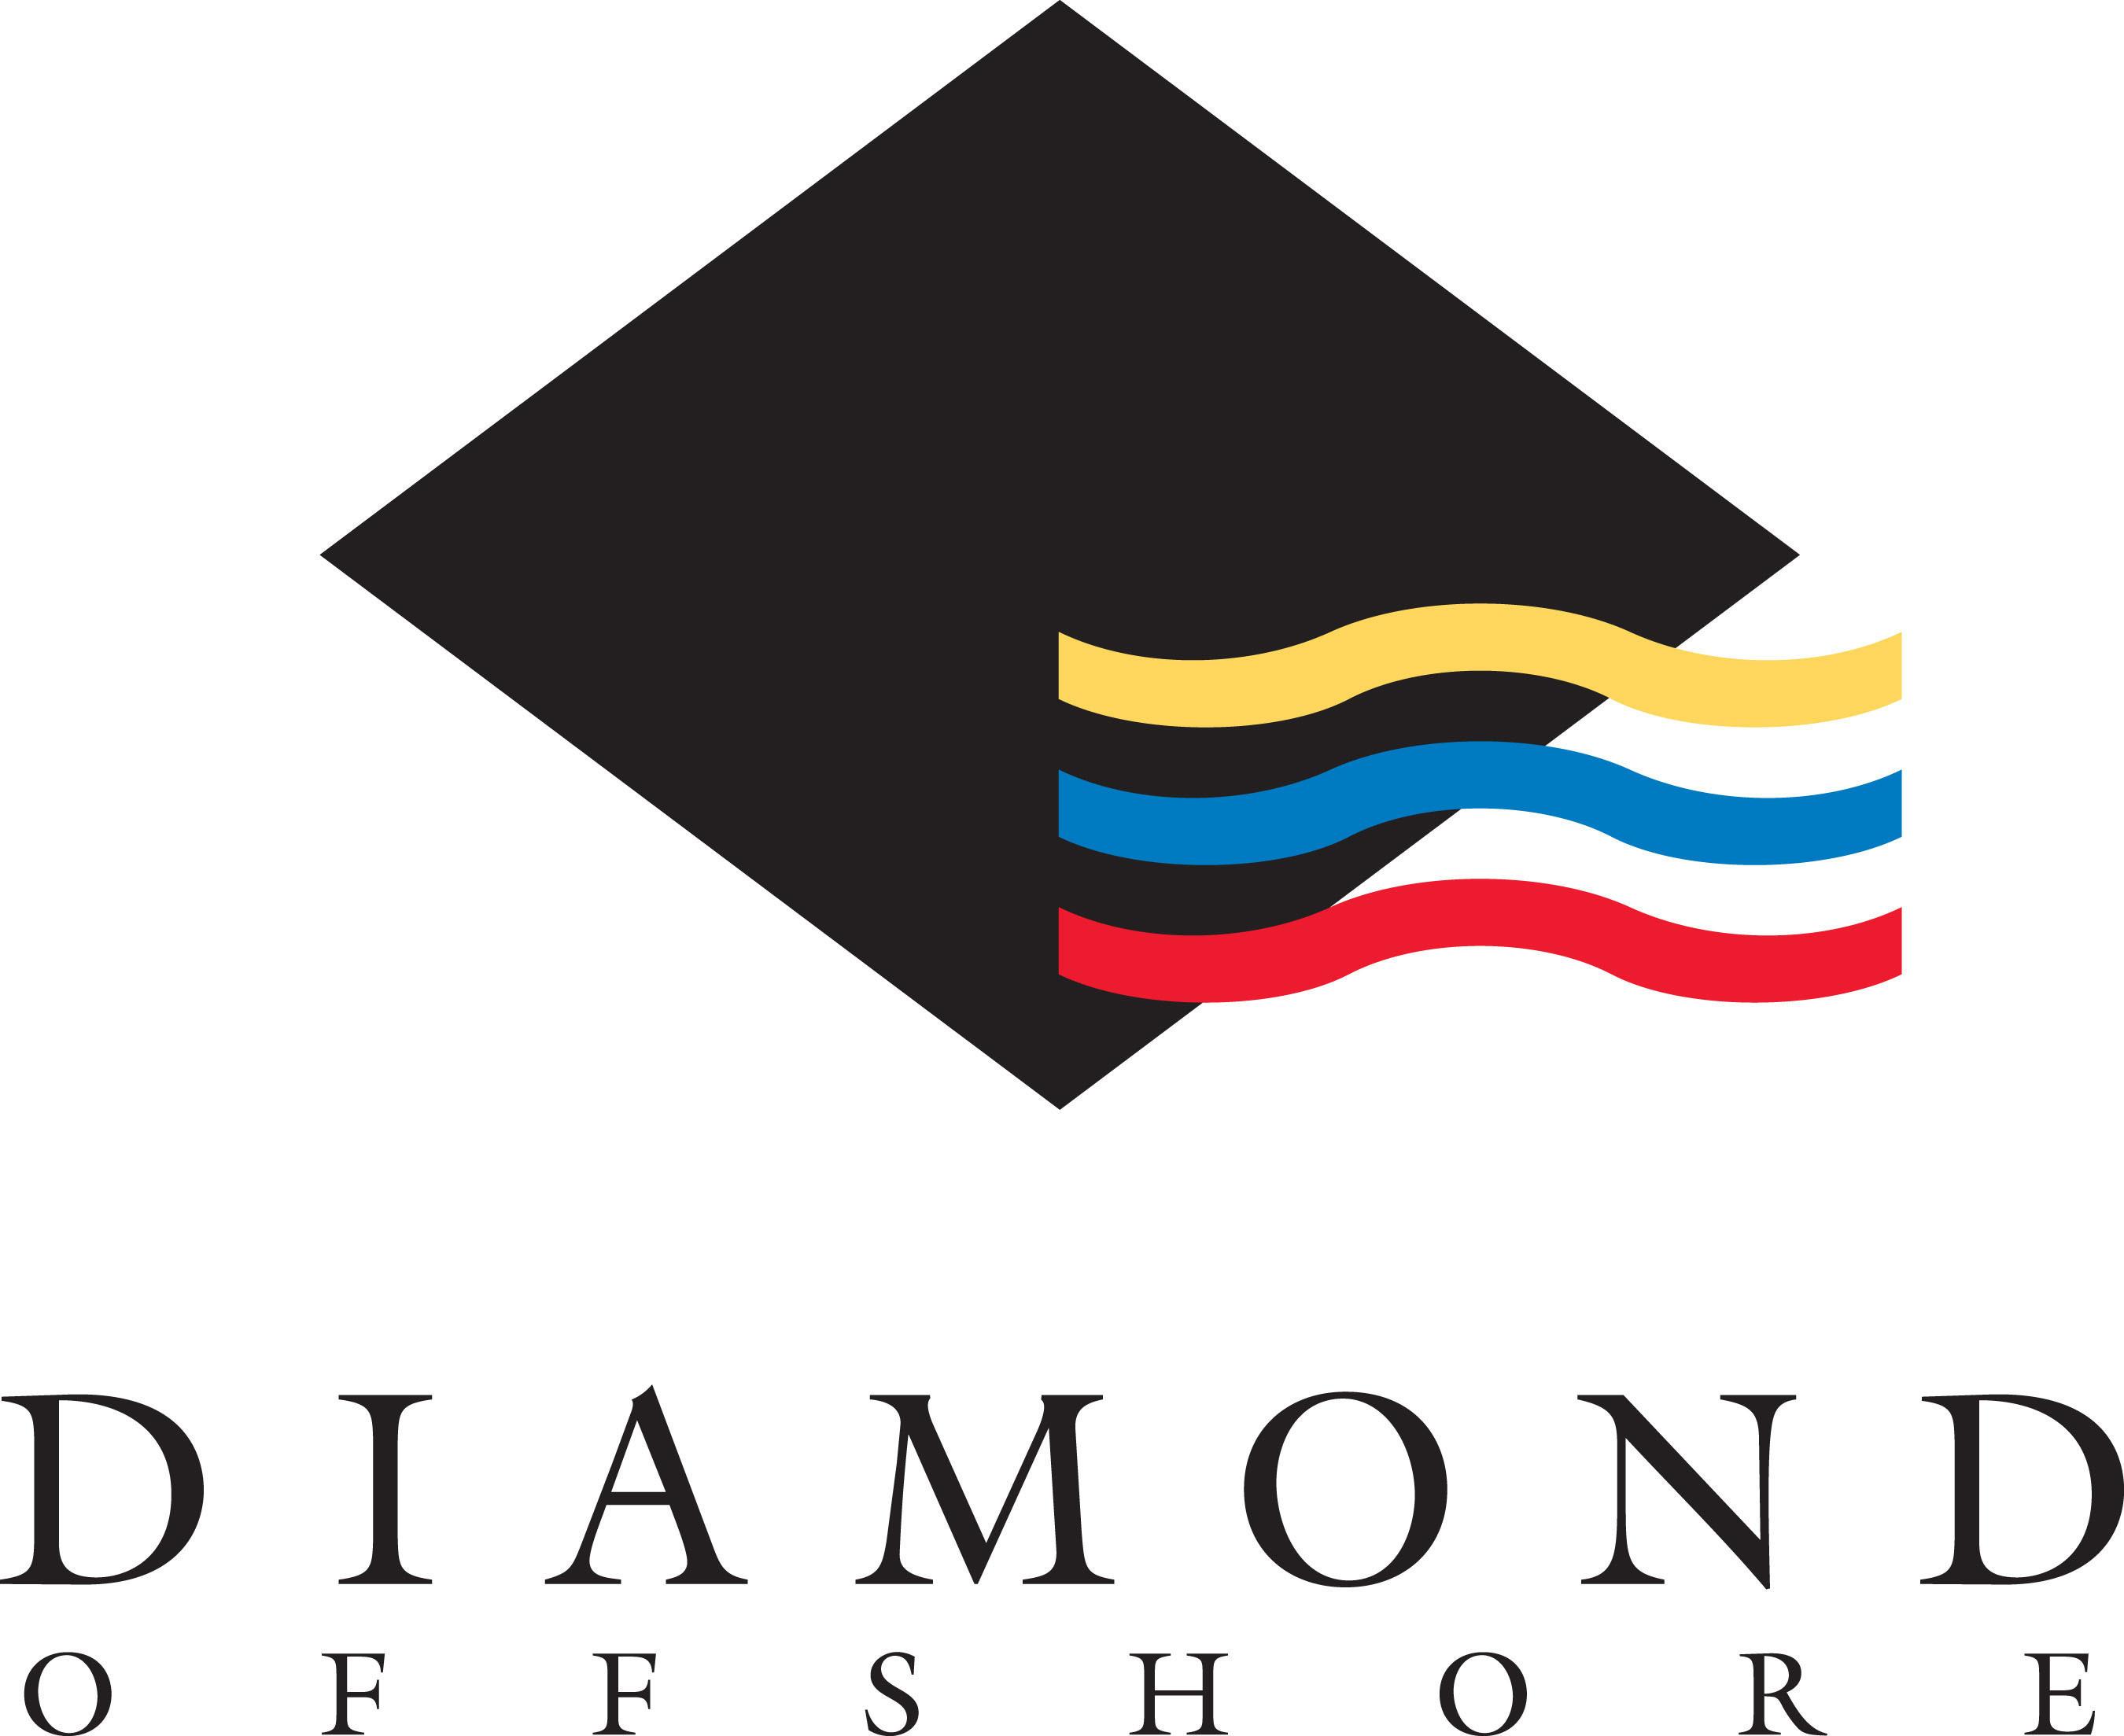 Diamond Offshore Uk